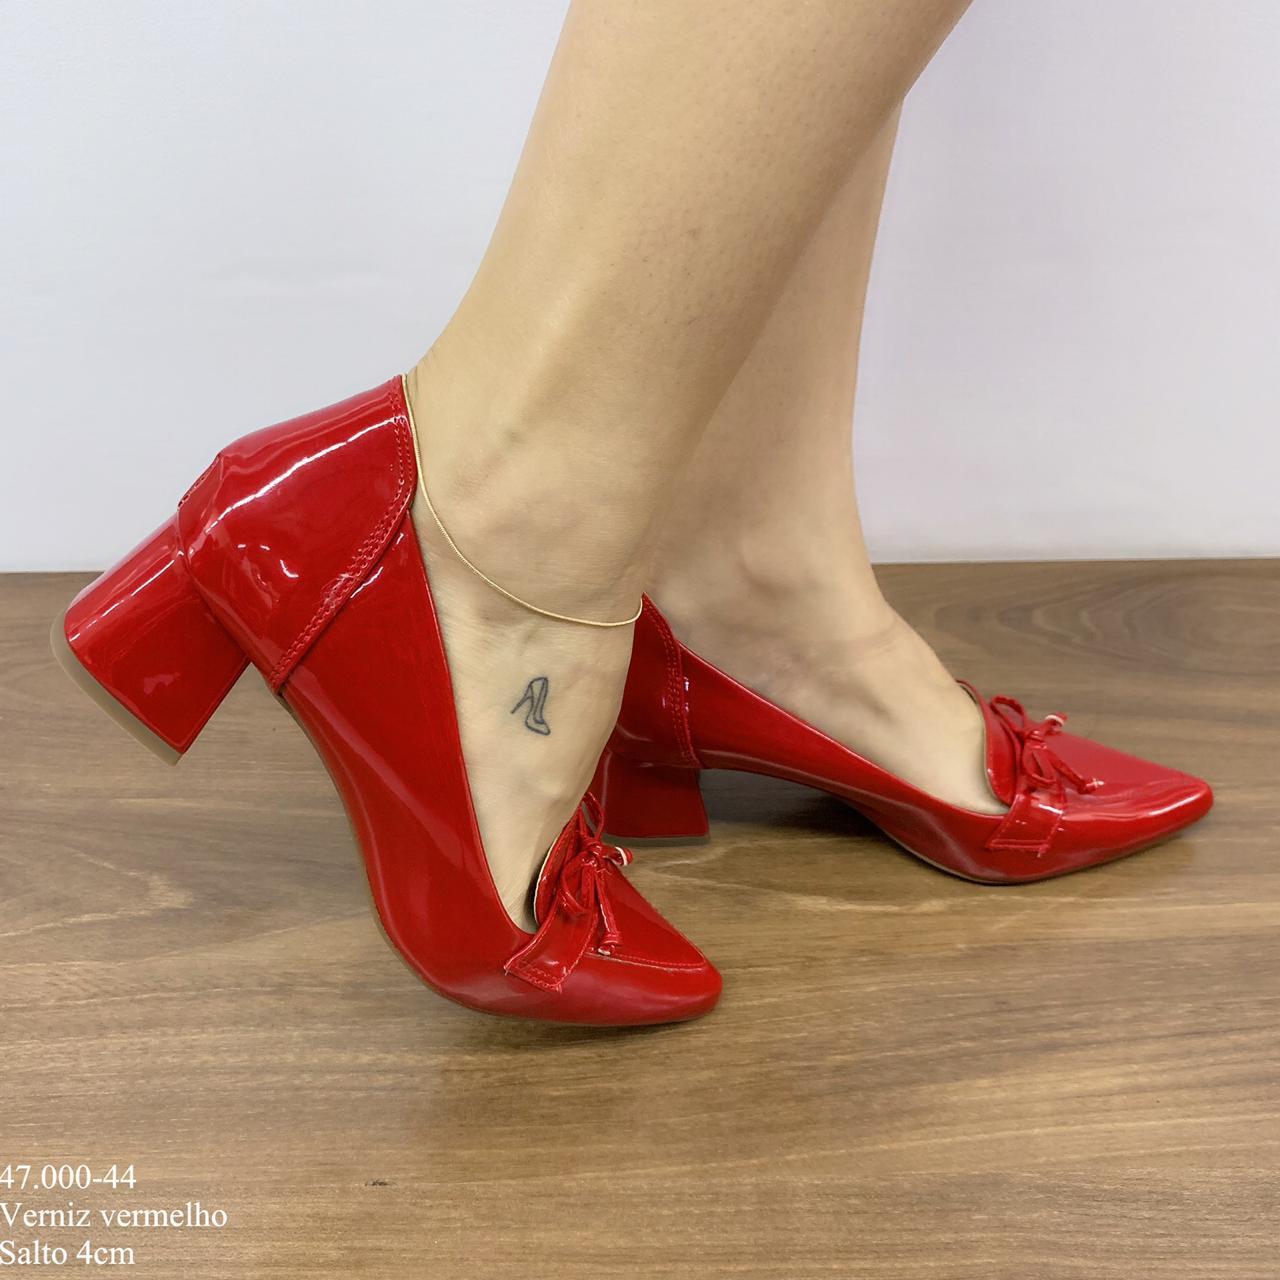 Scarpin Vermelho Verniz | D-47.000-44